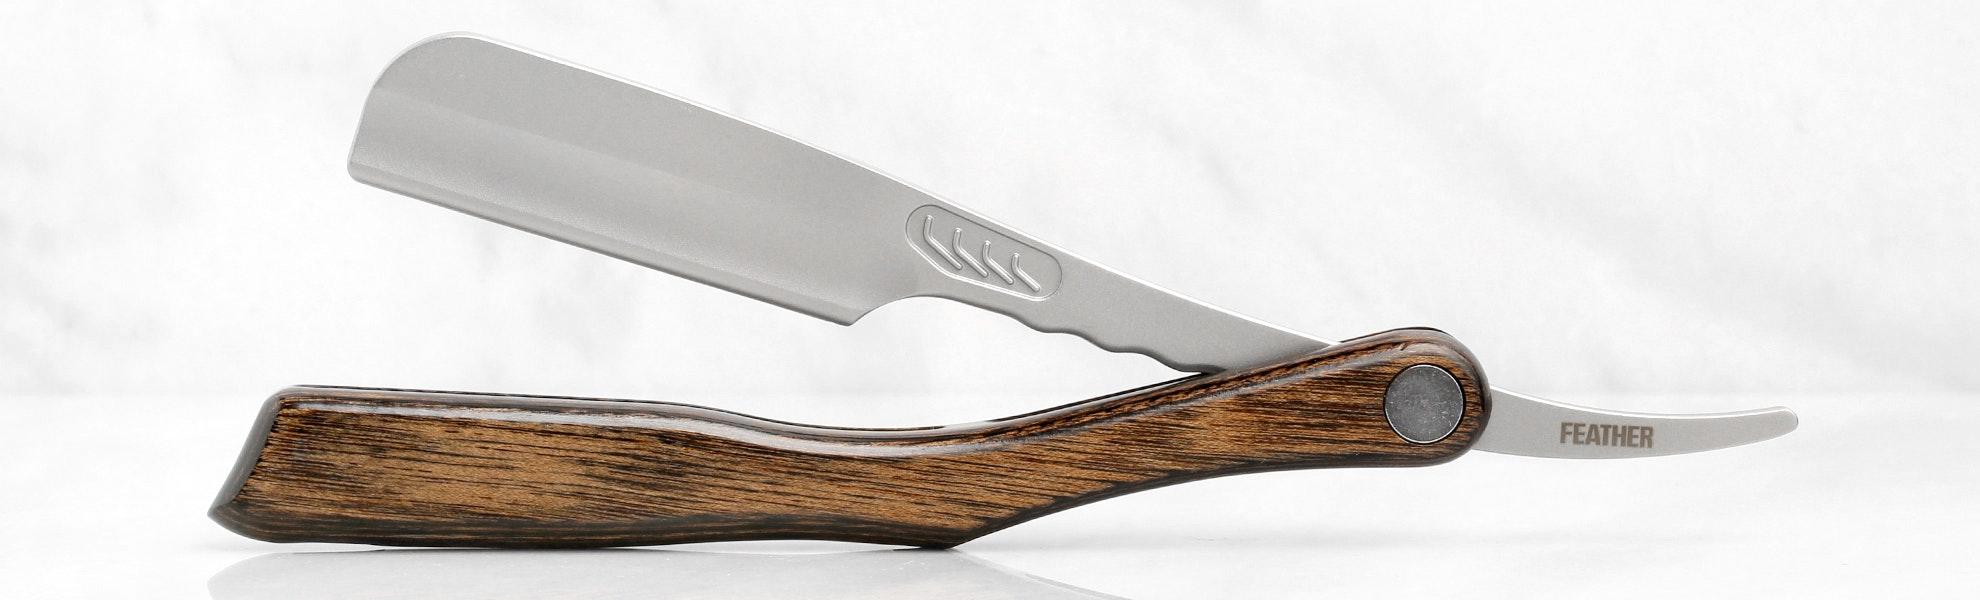 Feather Wood Artist Club Shaving Razor